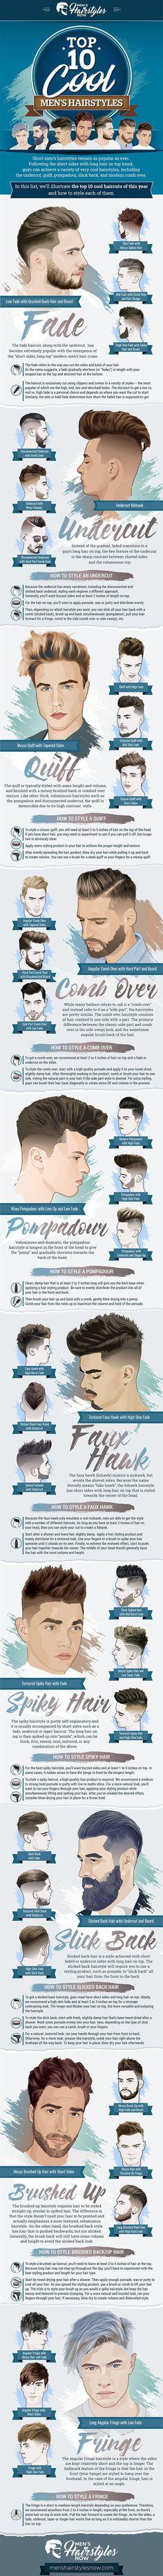 Haircut for men all angles febi husaeni febihusaeni on pinterest